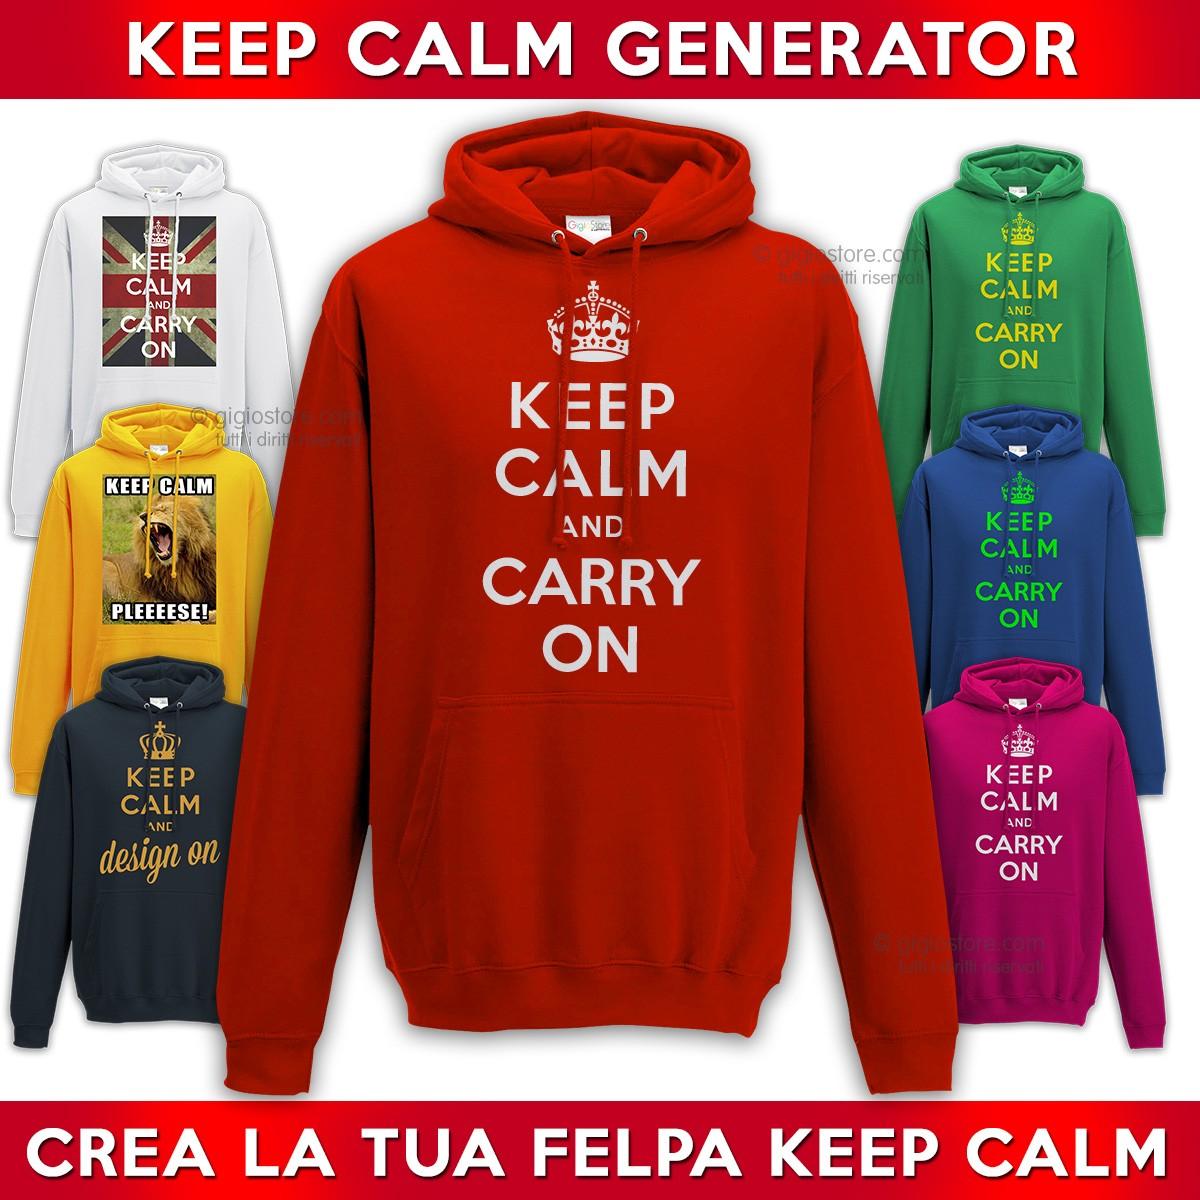 various colors eca6d 1c0d6 KEEP CALM Generator FELPA Personalizzata | Gigio Store